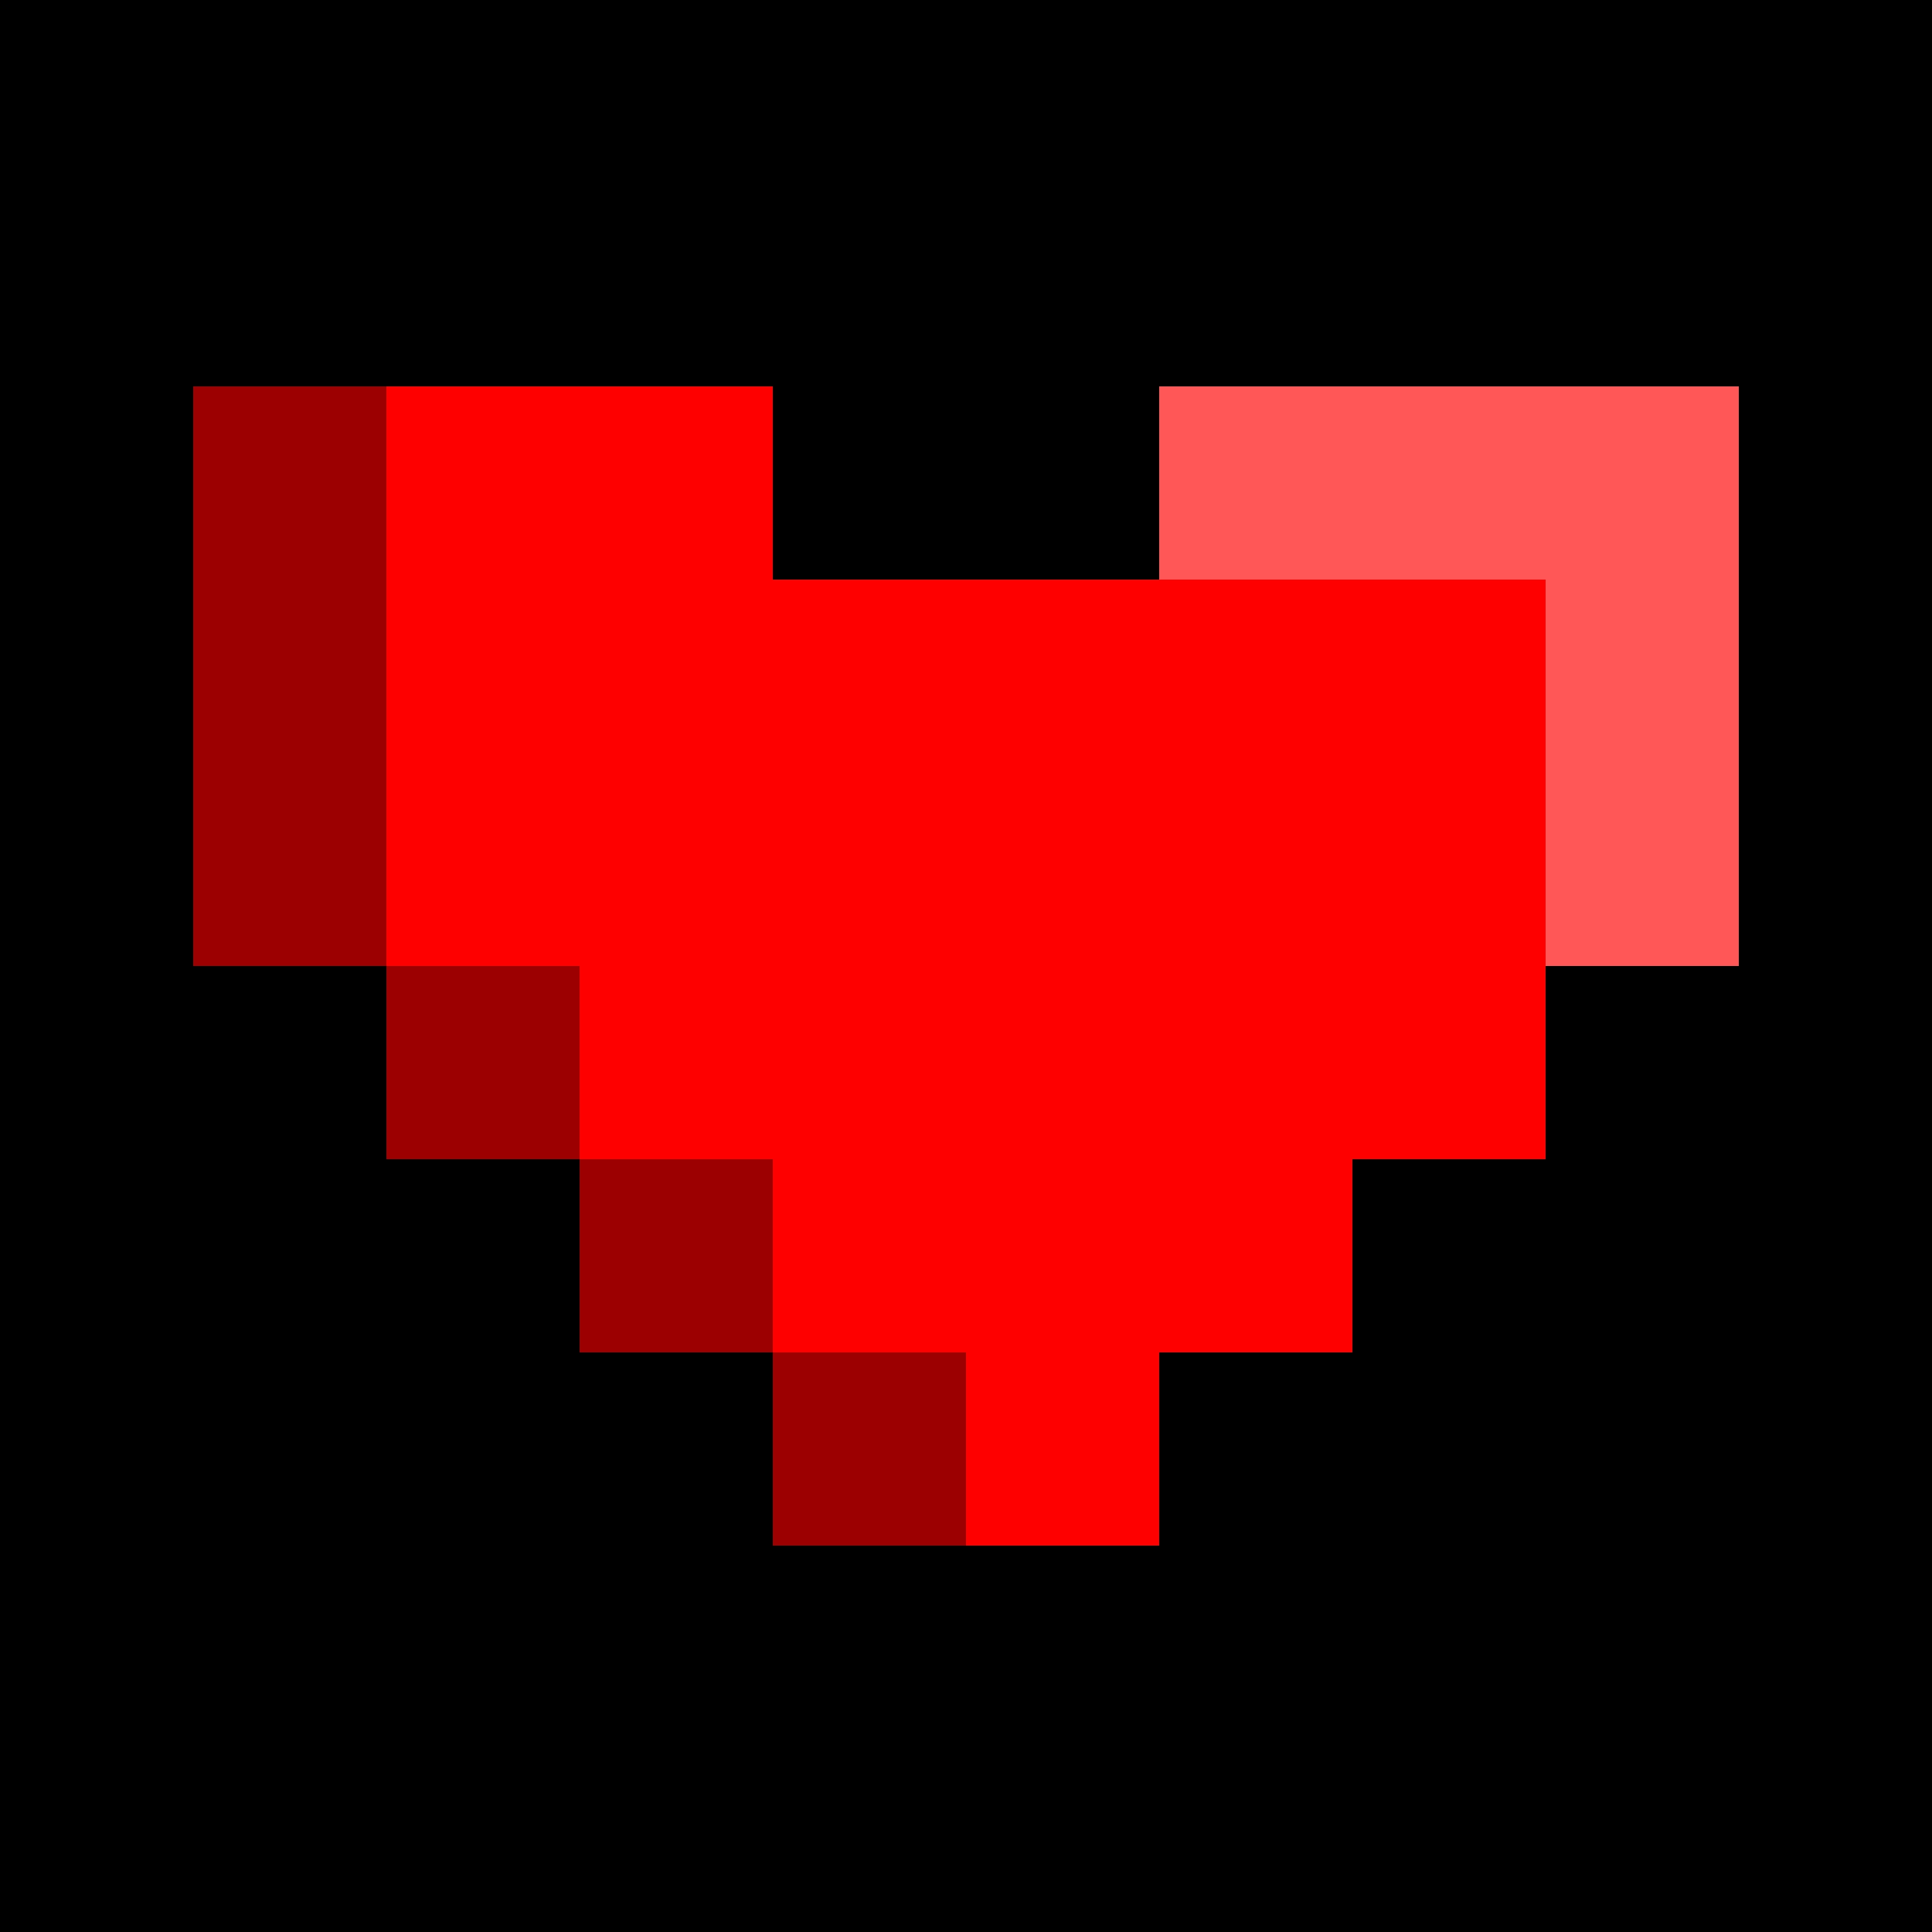 8bit Heart By Cliparteles Clip Art Library Pixel Art Maker Free Clip Art